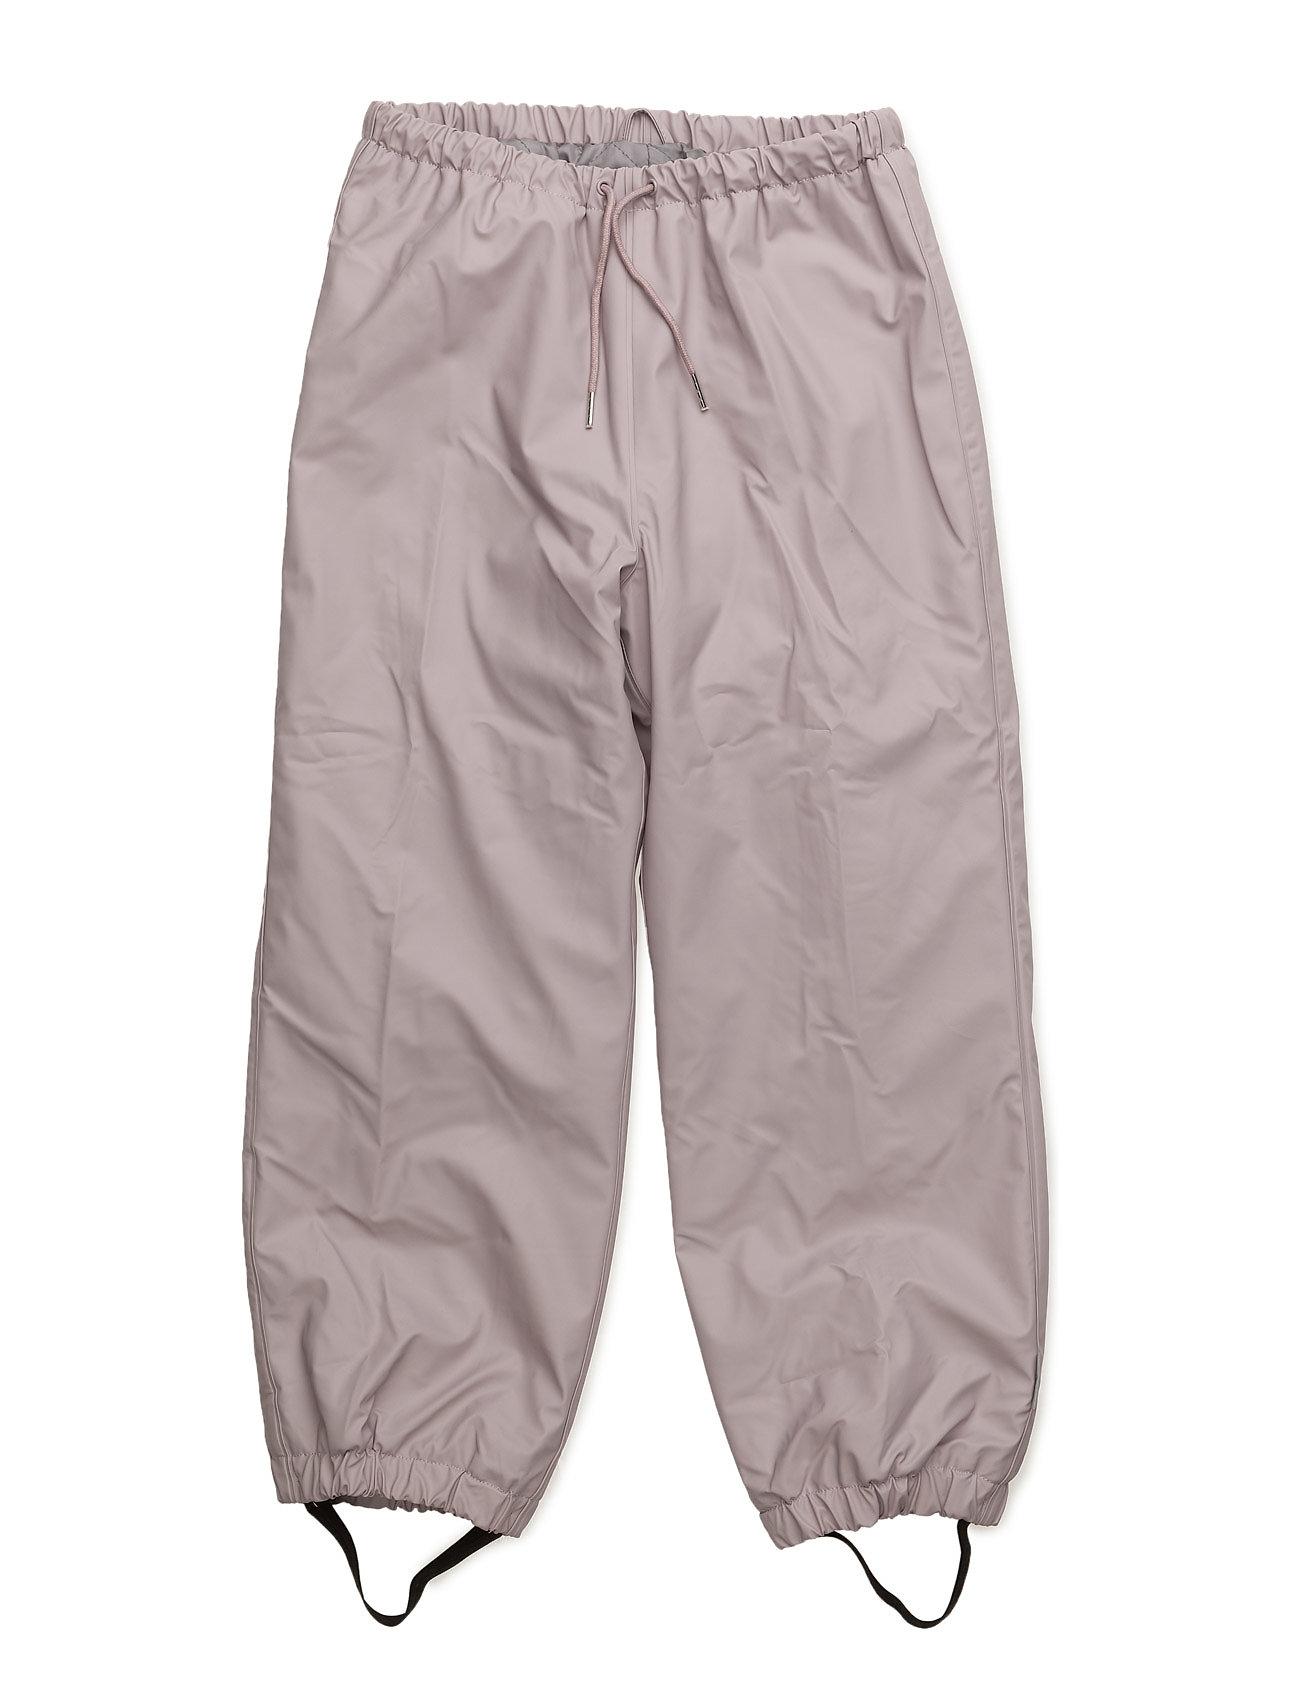 Mini A Ture Robin Lining, K Pants